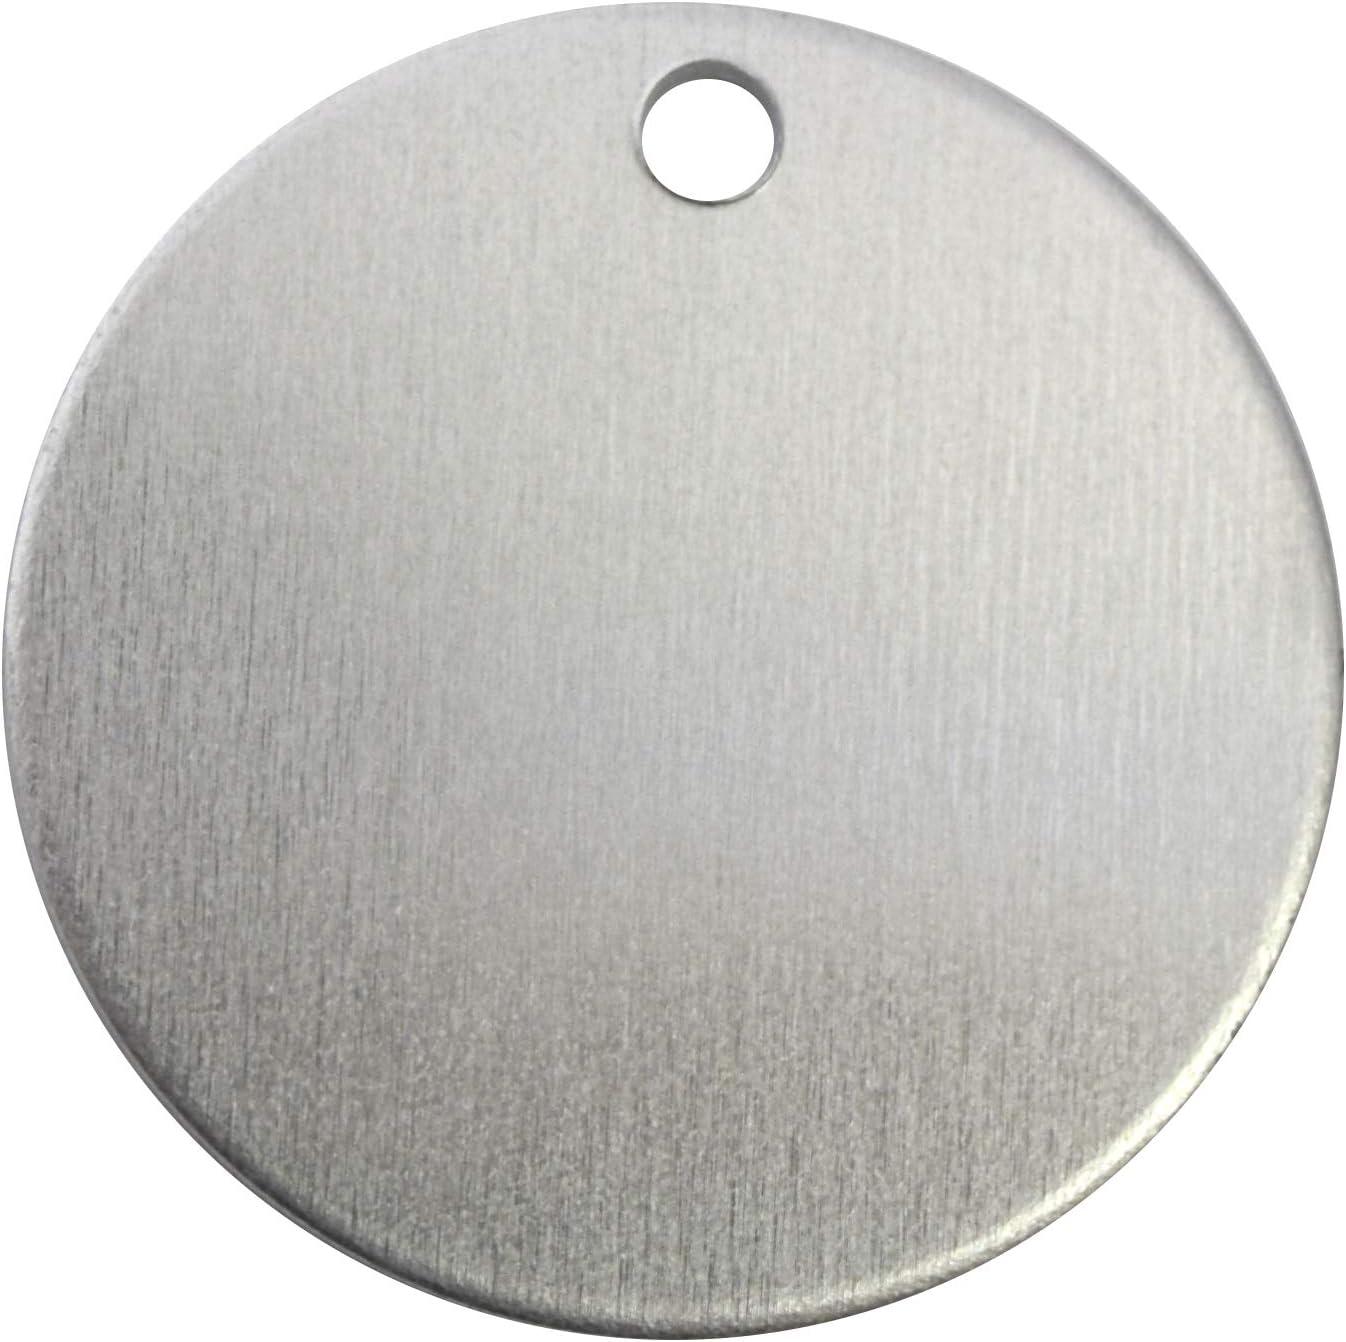 3 Bore Diameter SKF 19359 LDS /& Small Bore Seal 1.938 Shaft Diameter Inch R Lip Code CRW1 Style 0.313 Width